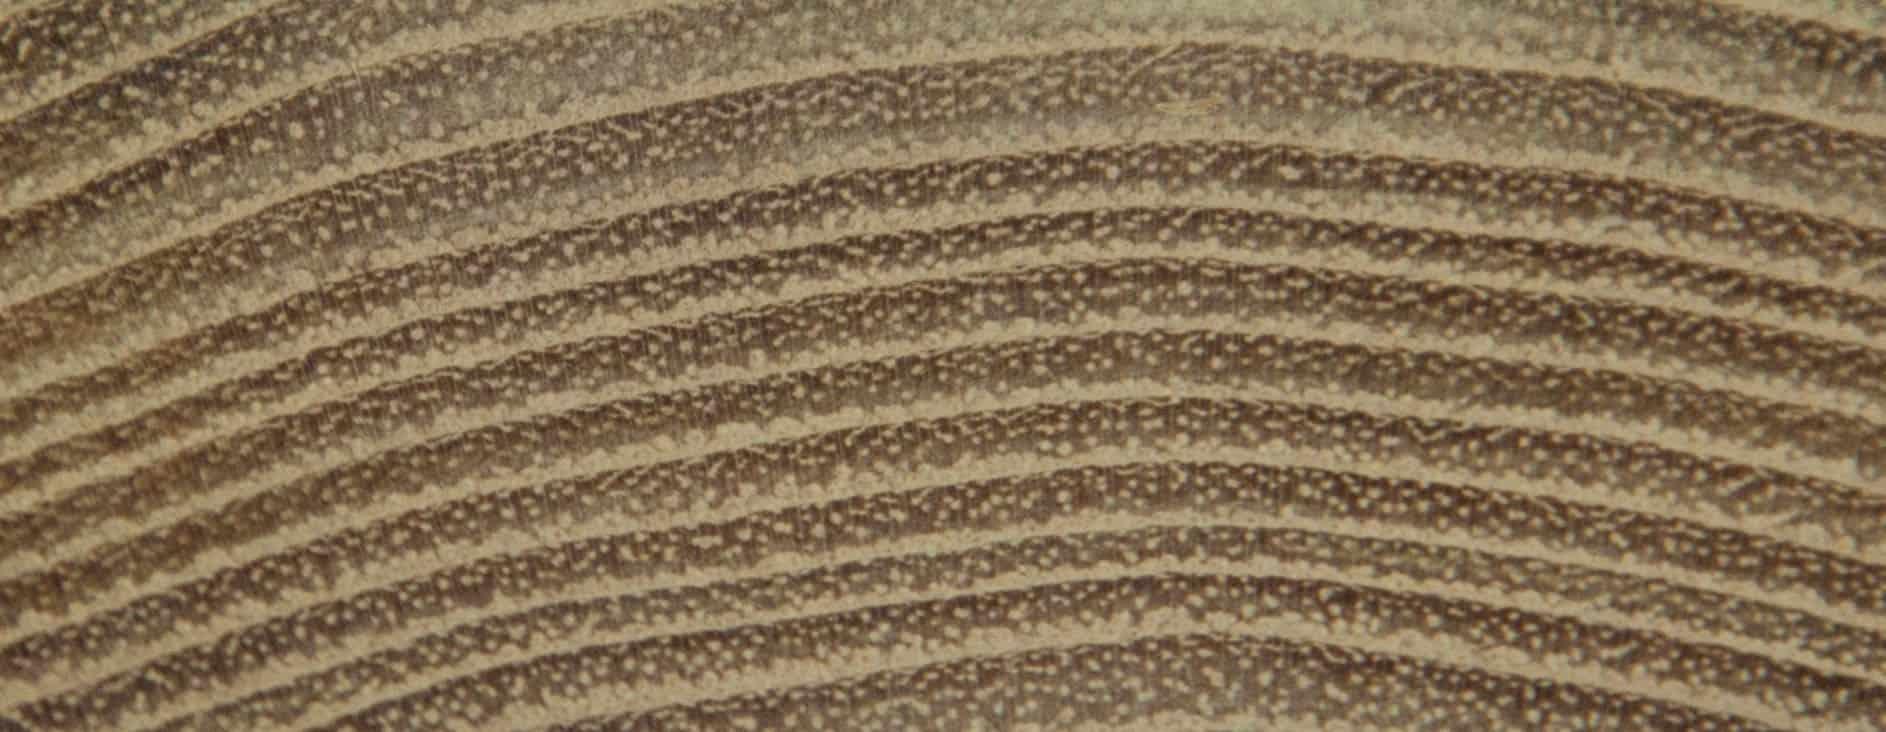 texture tranche de robinier